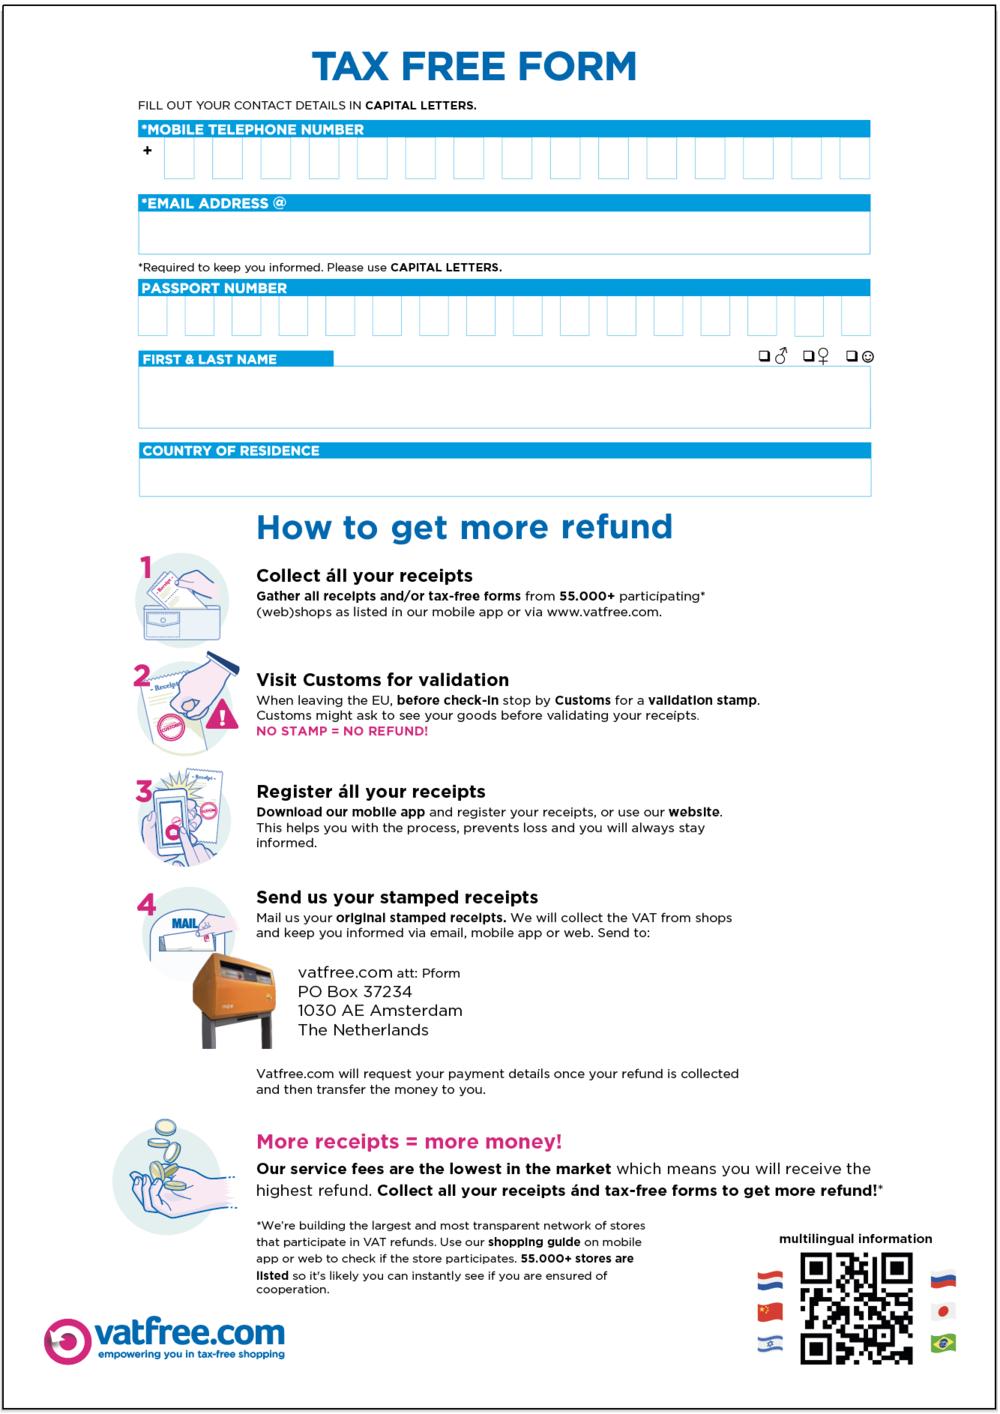 tax free form number  Download a VAT refund form: Vatfree.com Vatfree.com